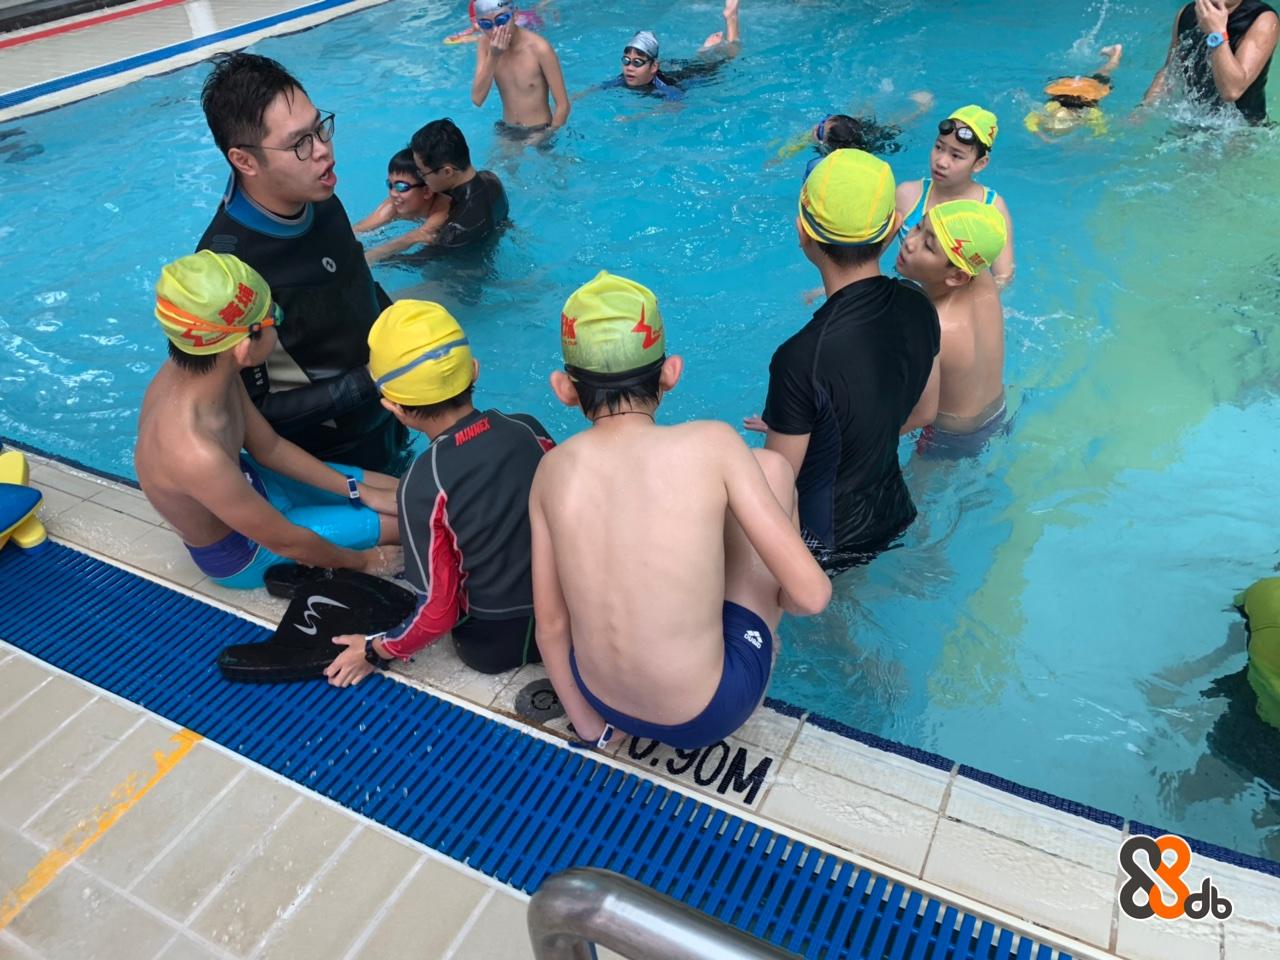 leisure,water,fun,swimming,sport venue